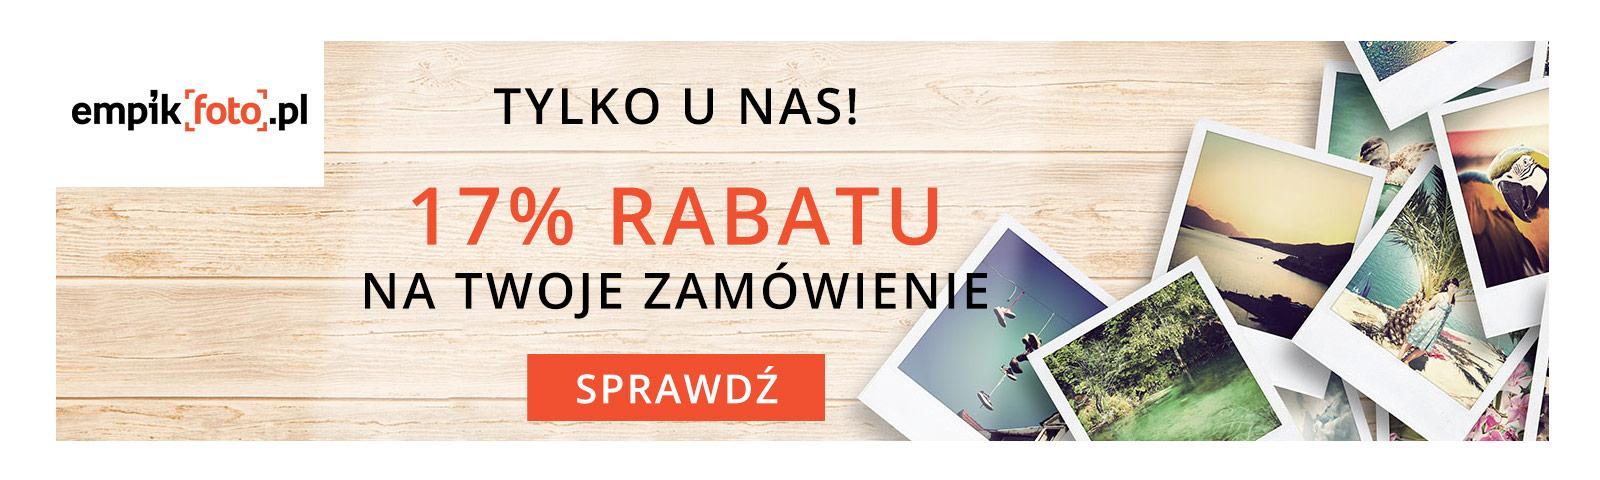 Empikfoto.pl kupony rabatowe